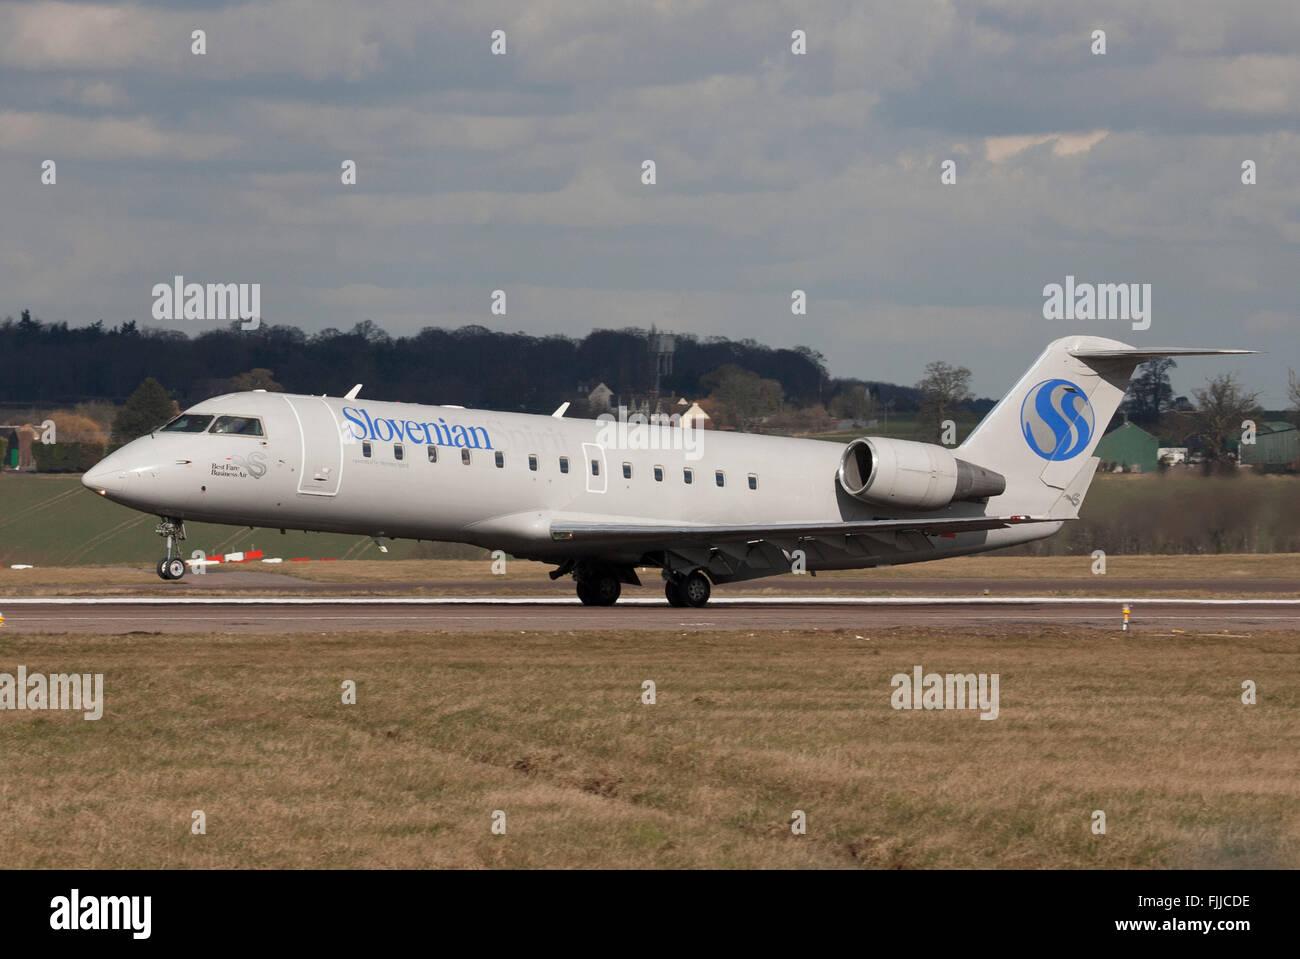 Canadair CL600 Slovenian Airlines landing LTN - Stock Image